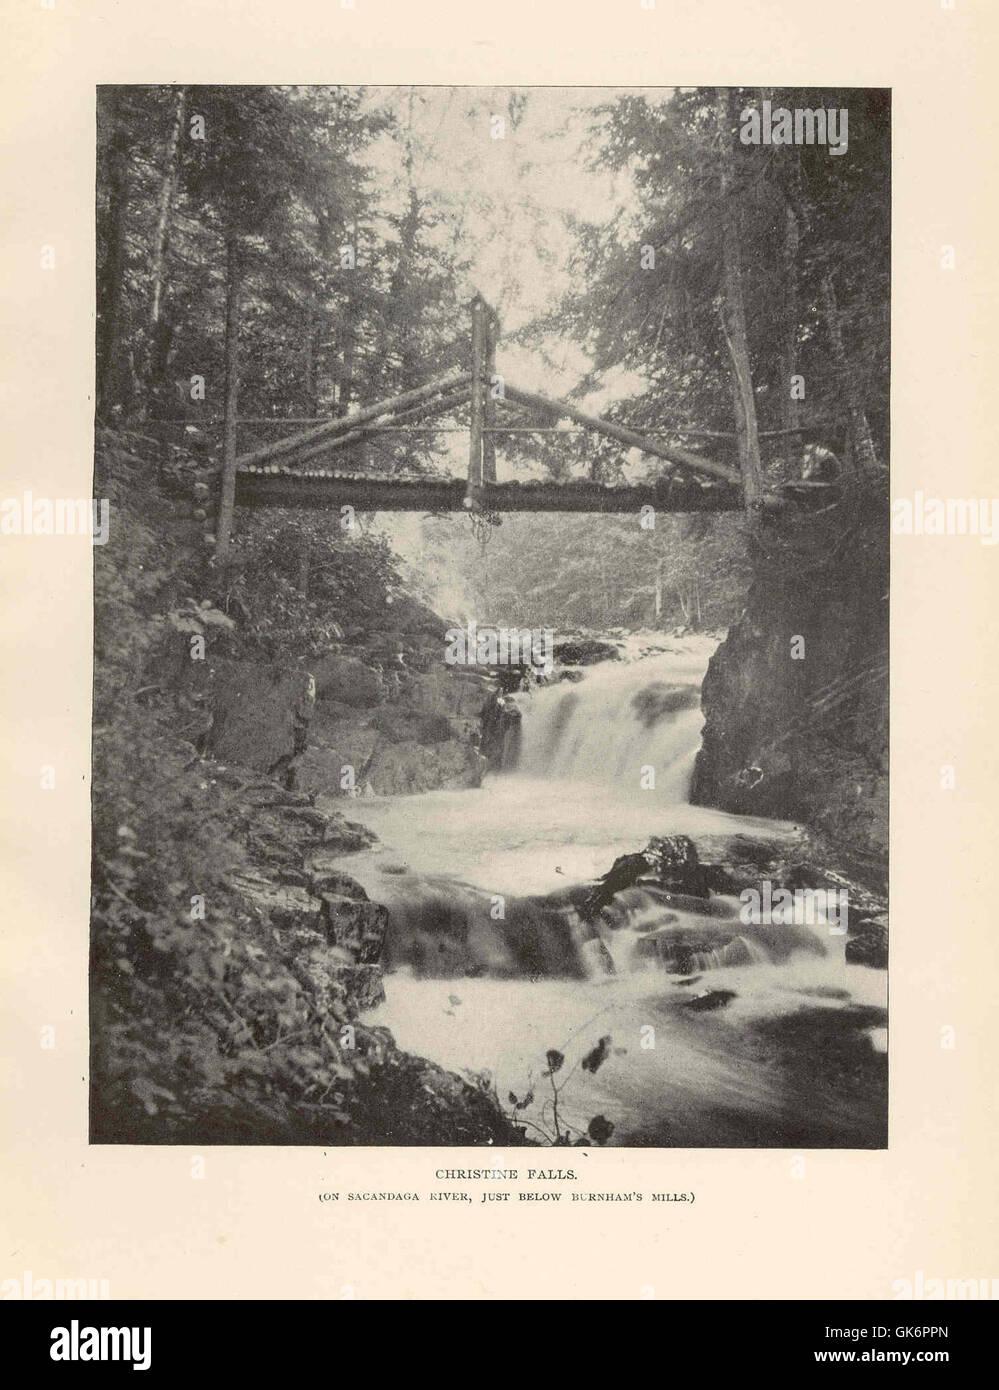 41648 Christine Falls (On Sacandaga River, just below Burnham's Mills) - Stock Image